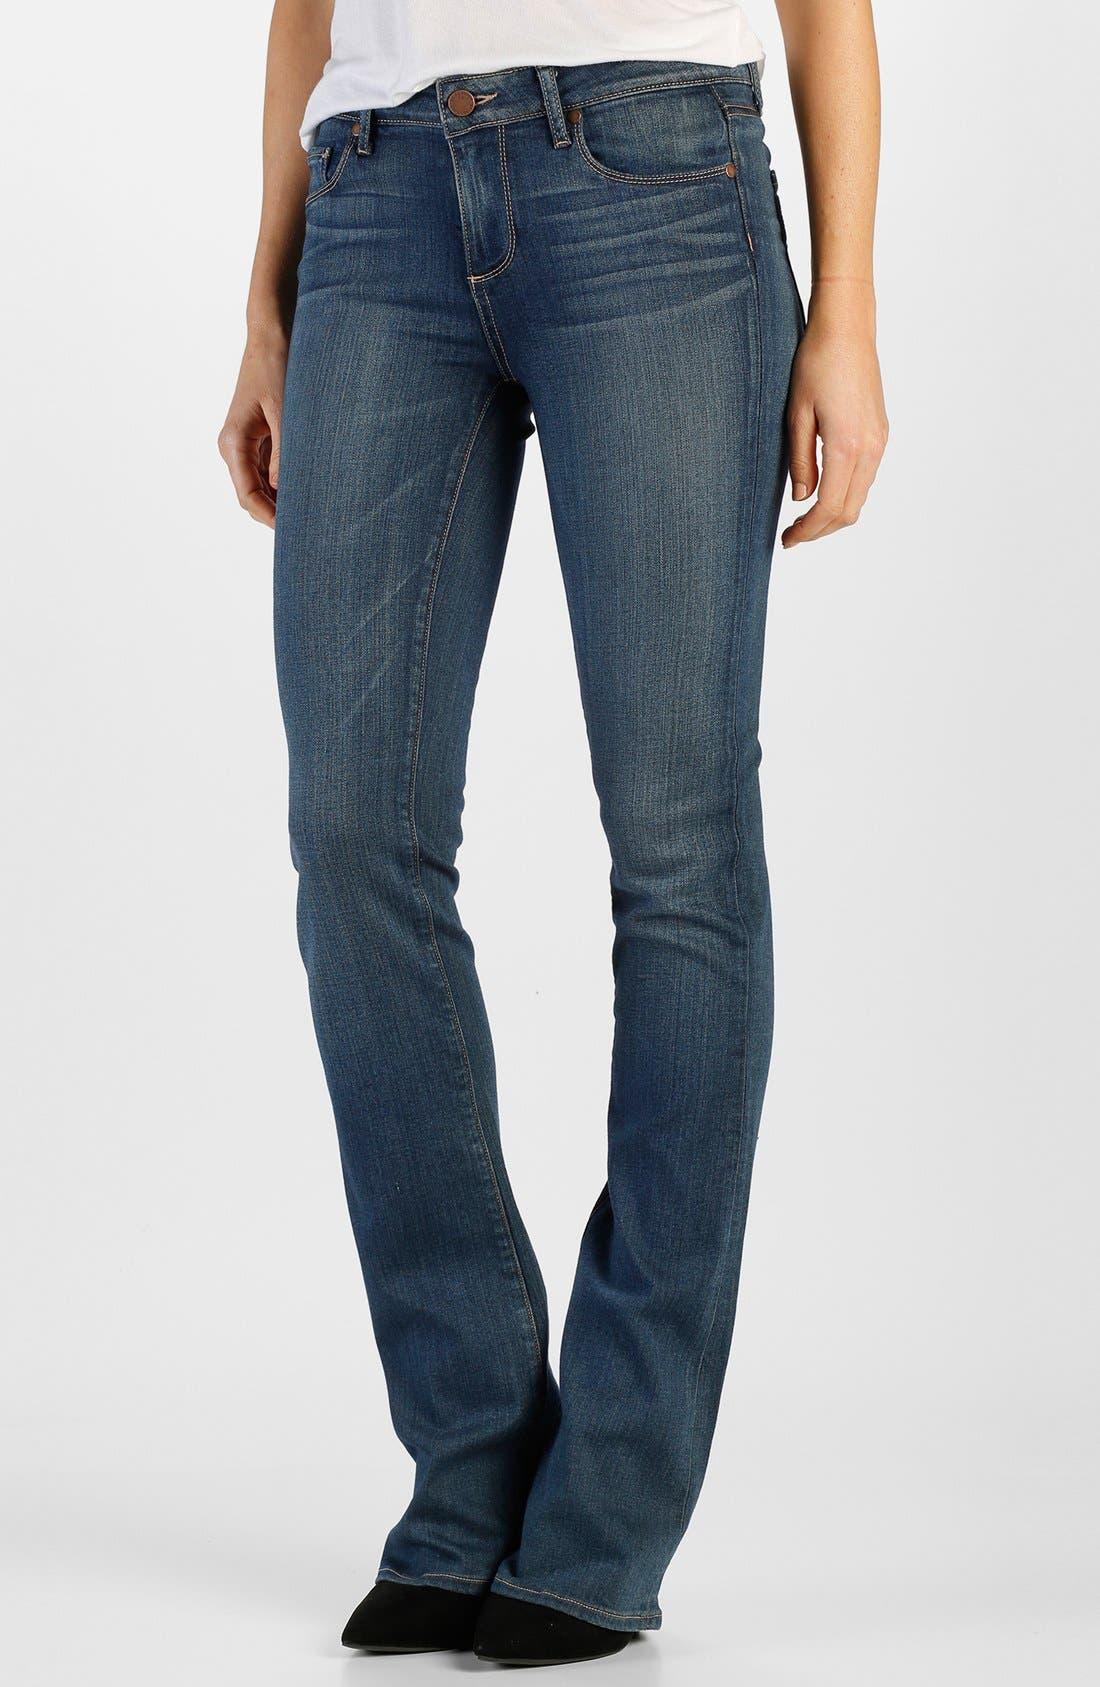 Alternate Image 1 Selected - Paige Denim 'Manhattan' Bootcut Jeans (Lex)